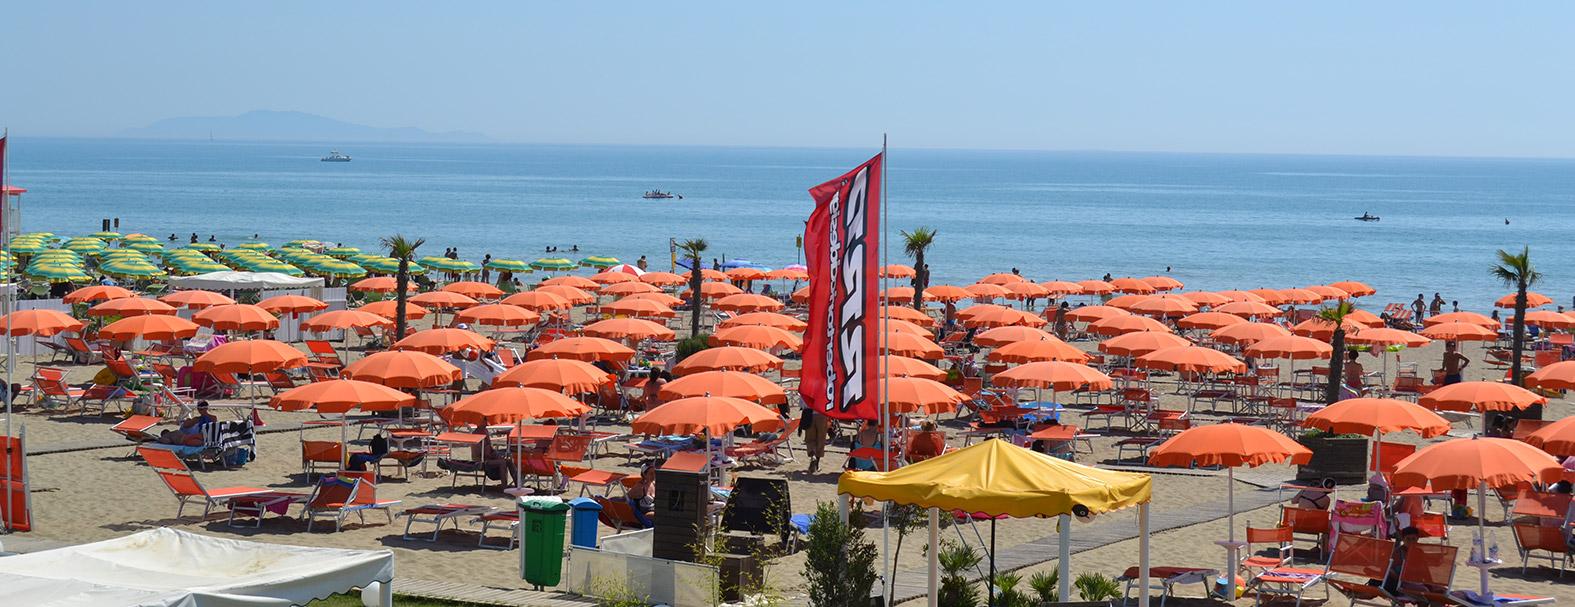 Moreno Beach